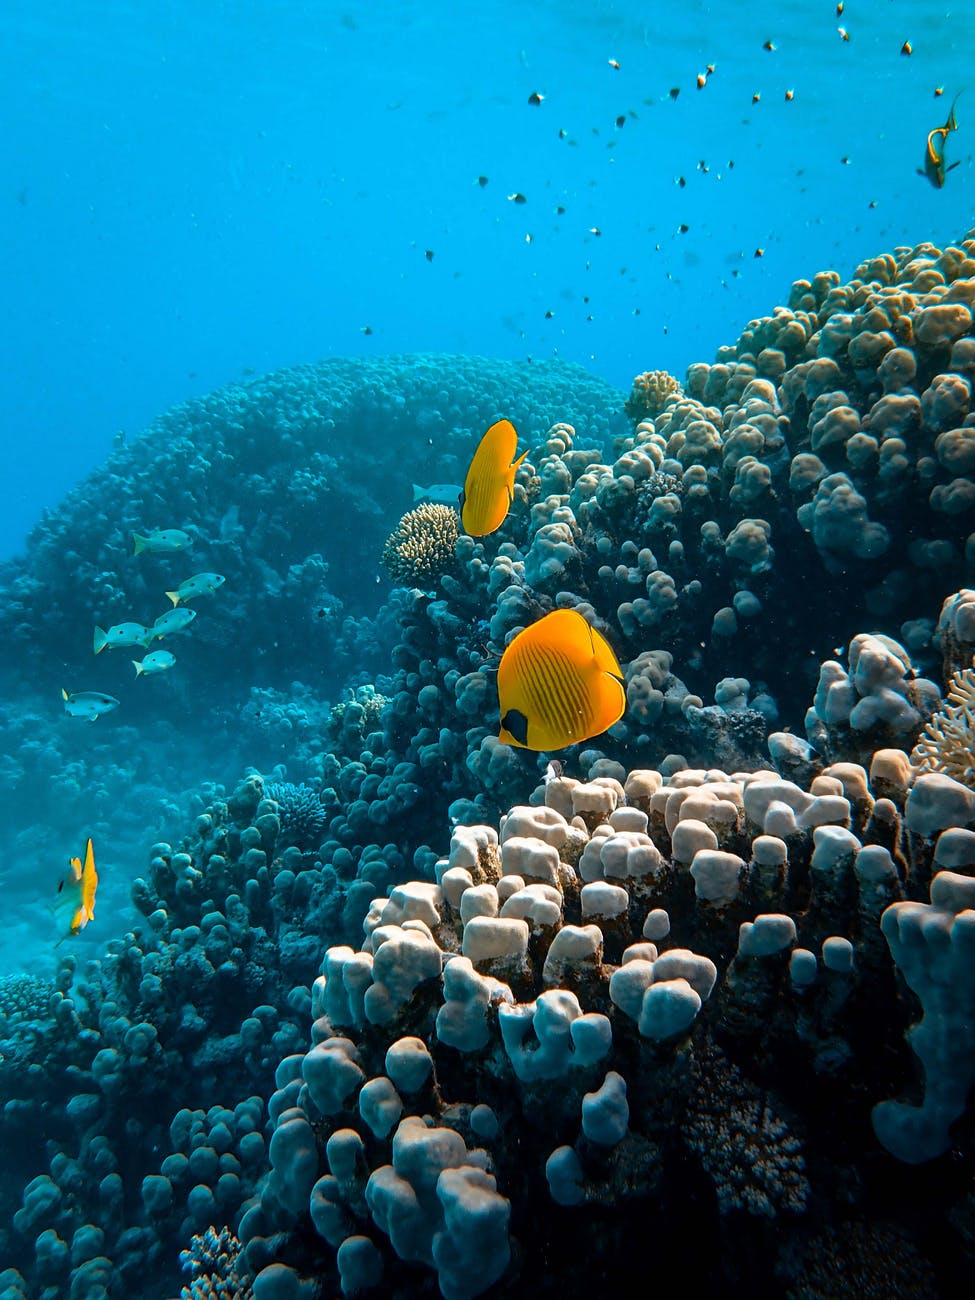 photo of sea animals near coral reefs